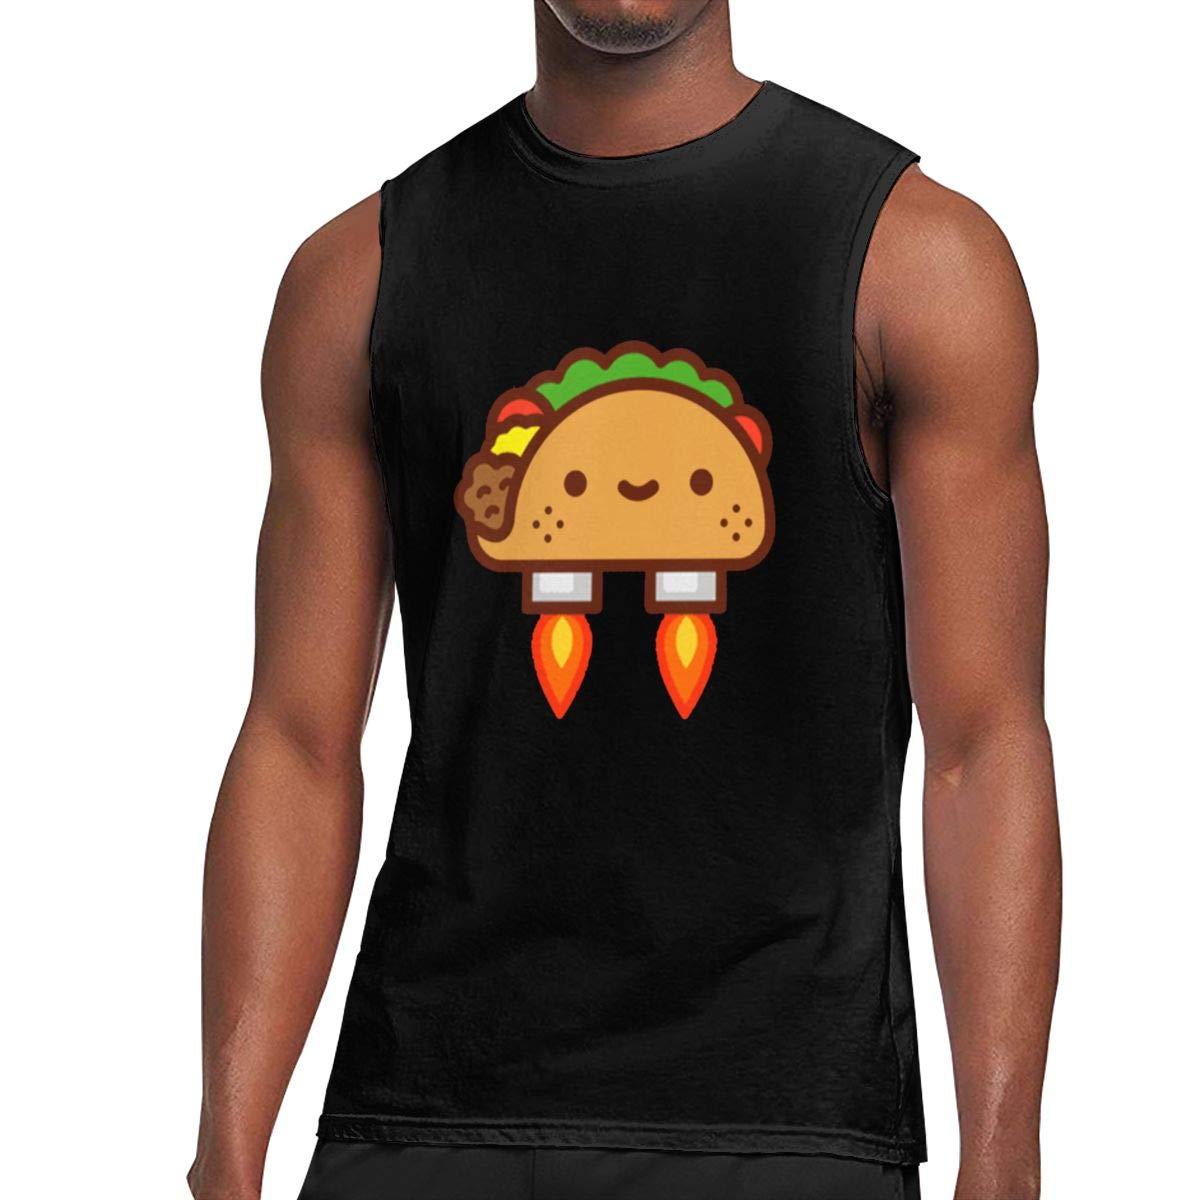 Seuriamin Tacos Rocket Humor Jogging Sleeveless Muscle Short Sleeve T Shirts